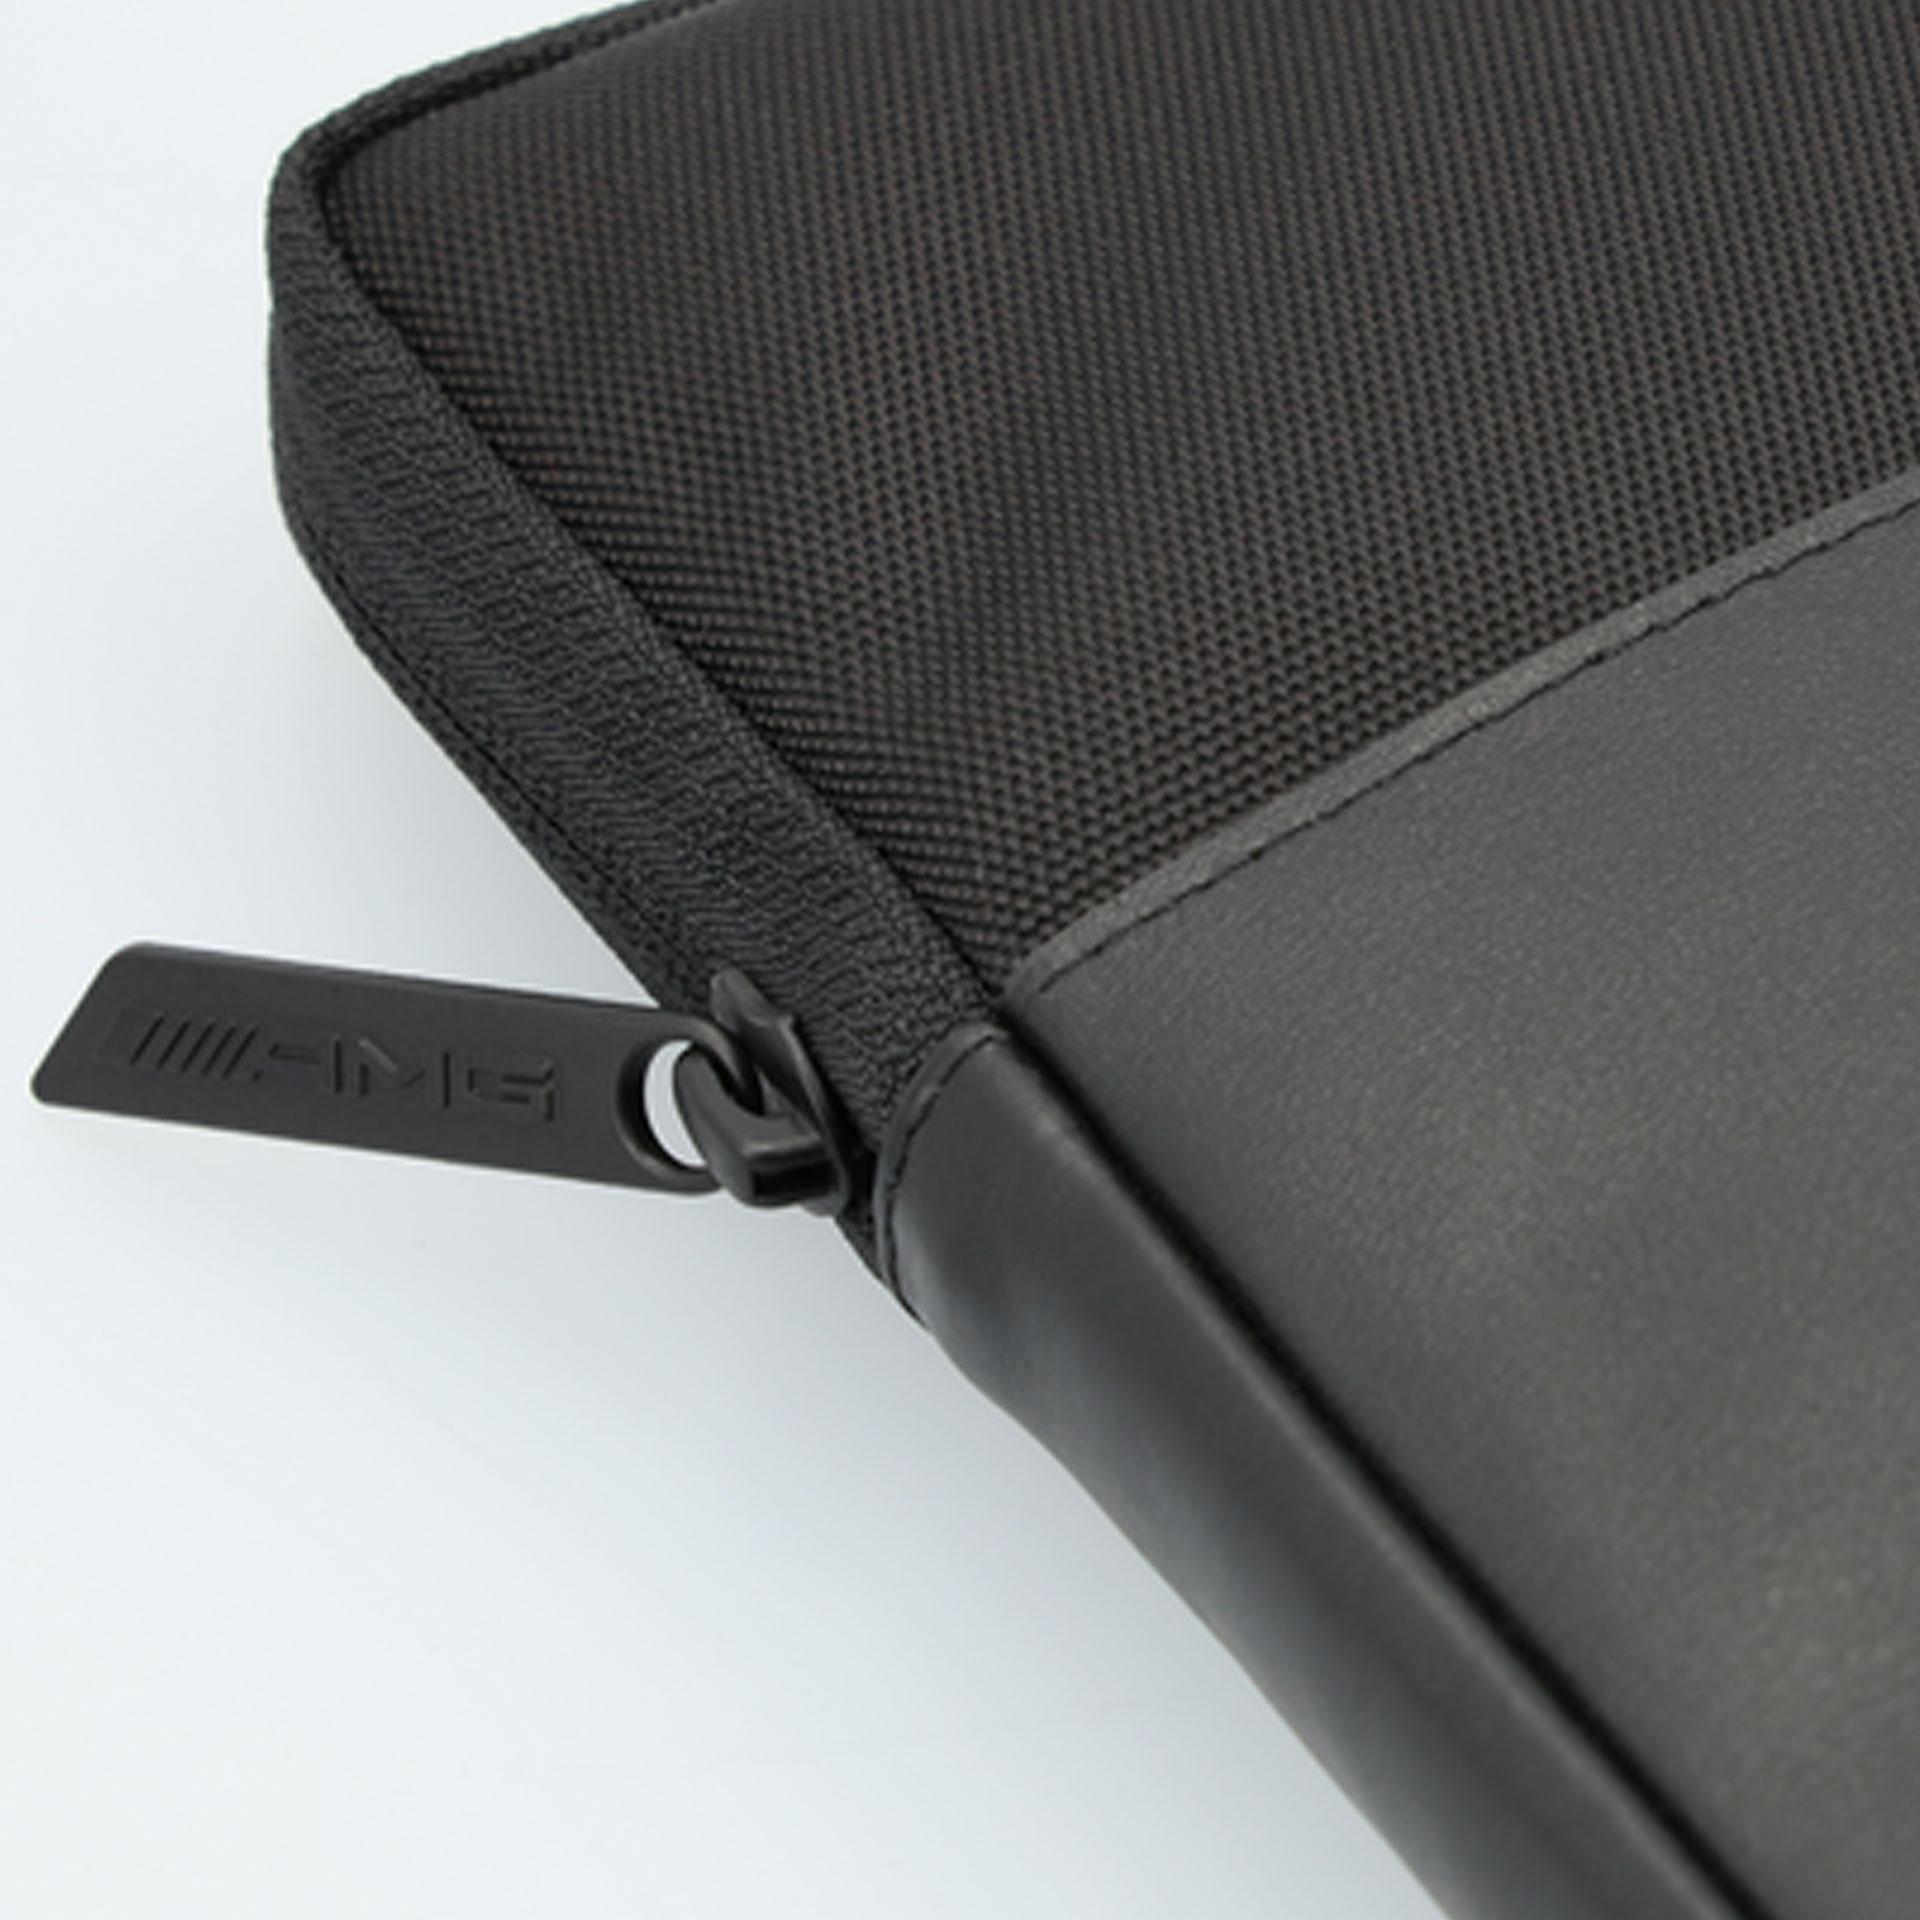 AMG Laptophülle schwarz Rindleder/Nylon bis 13 Zoll